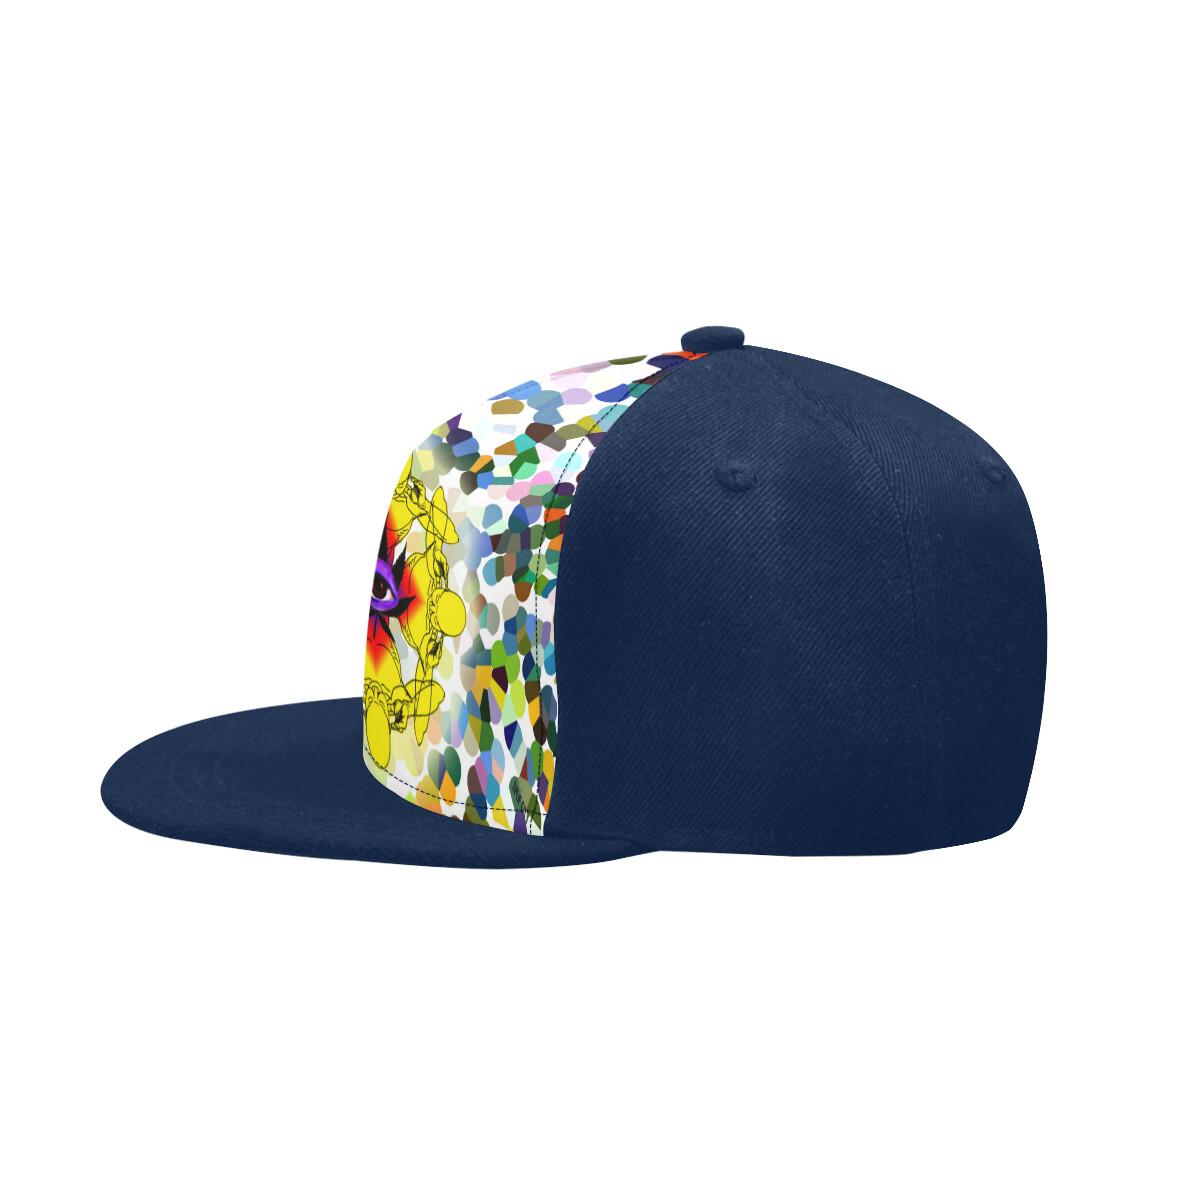 SC Higher Vision Printed Snapback Cap - Blue